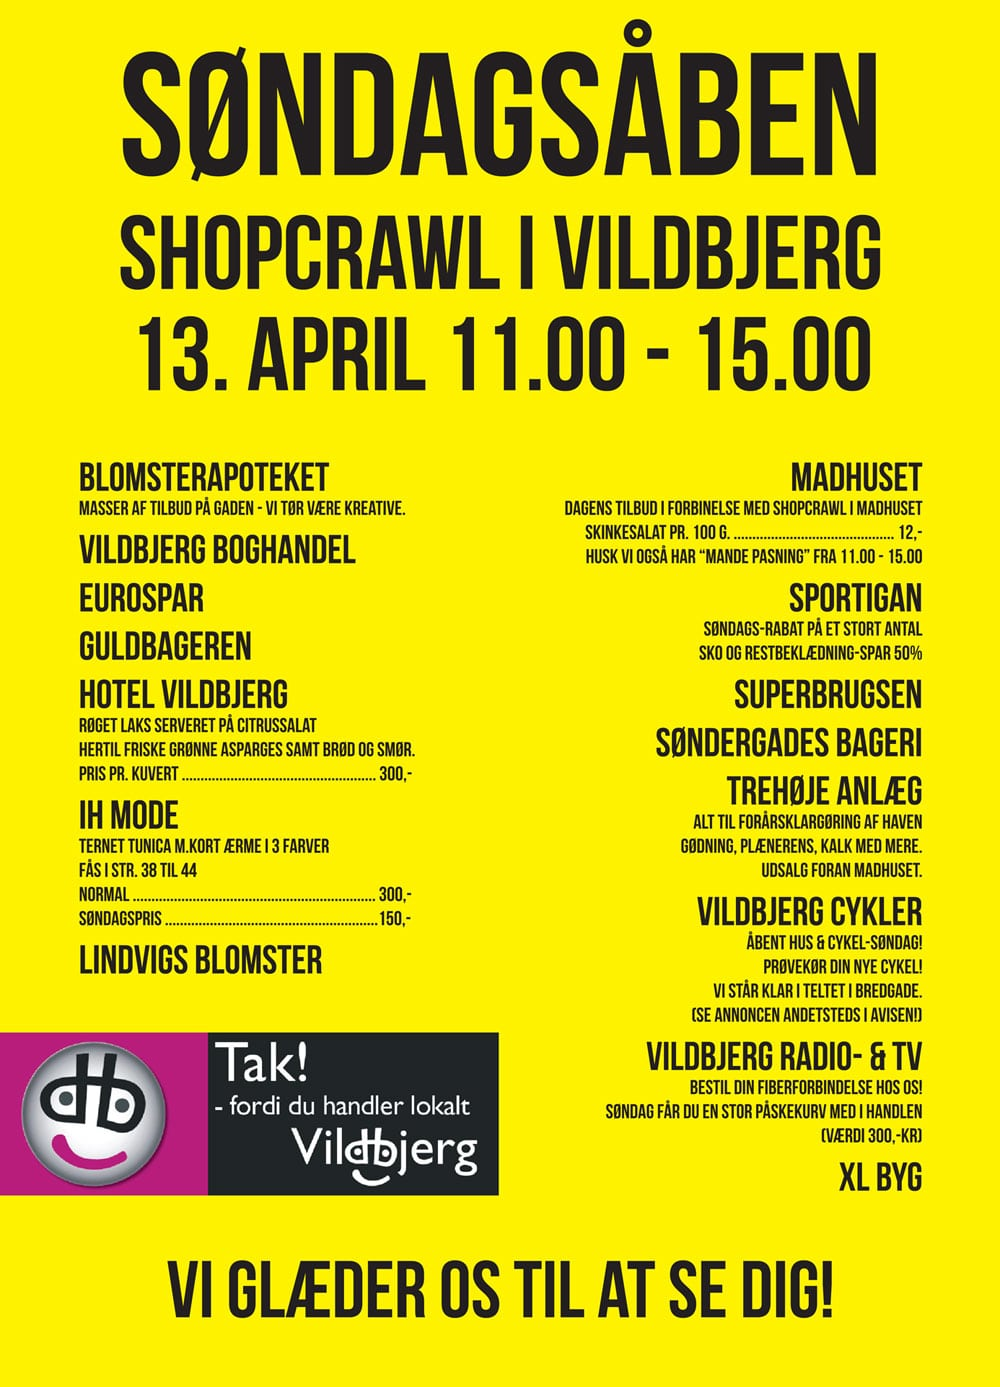 Vildbjerg Handelsforening ShopCrawl Annonce